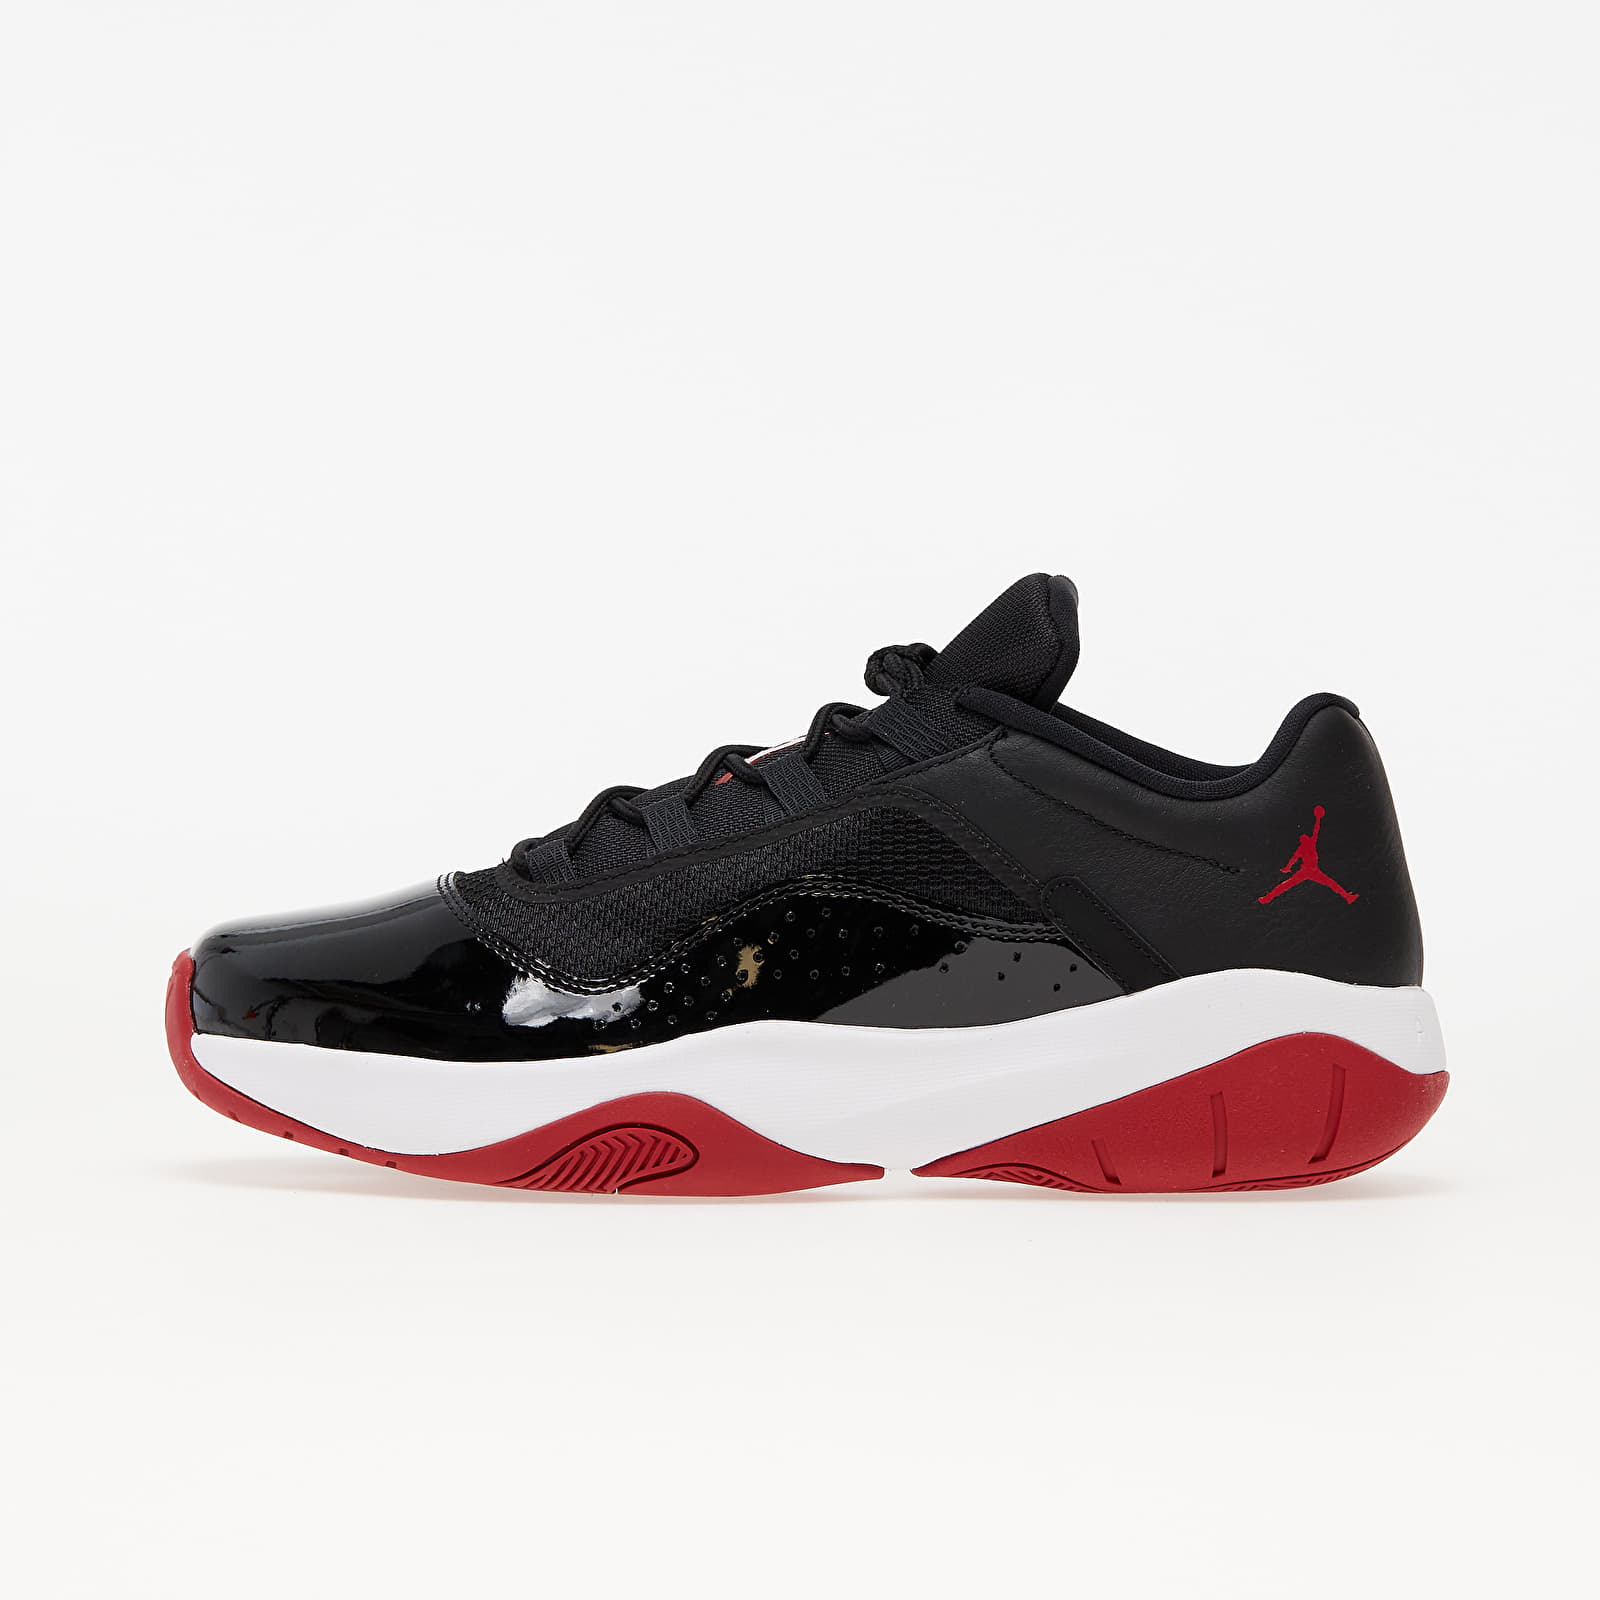 Air Jordan 11 CMFT Low Black/ White-Gym Red EUR 40.5